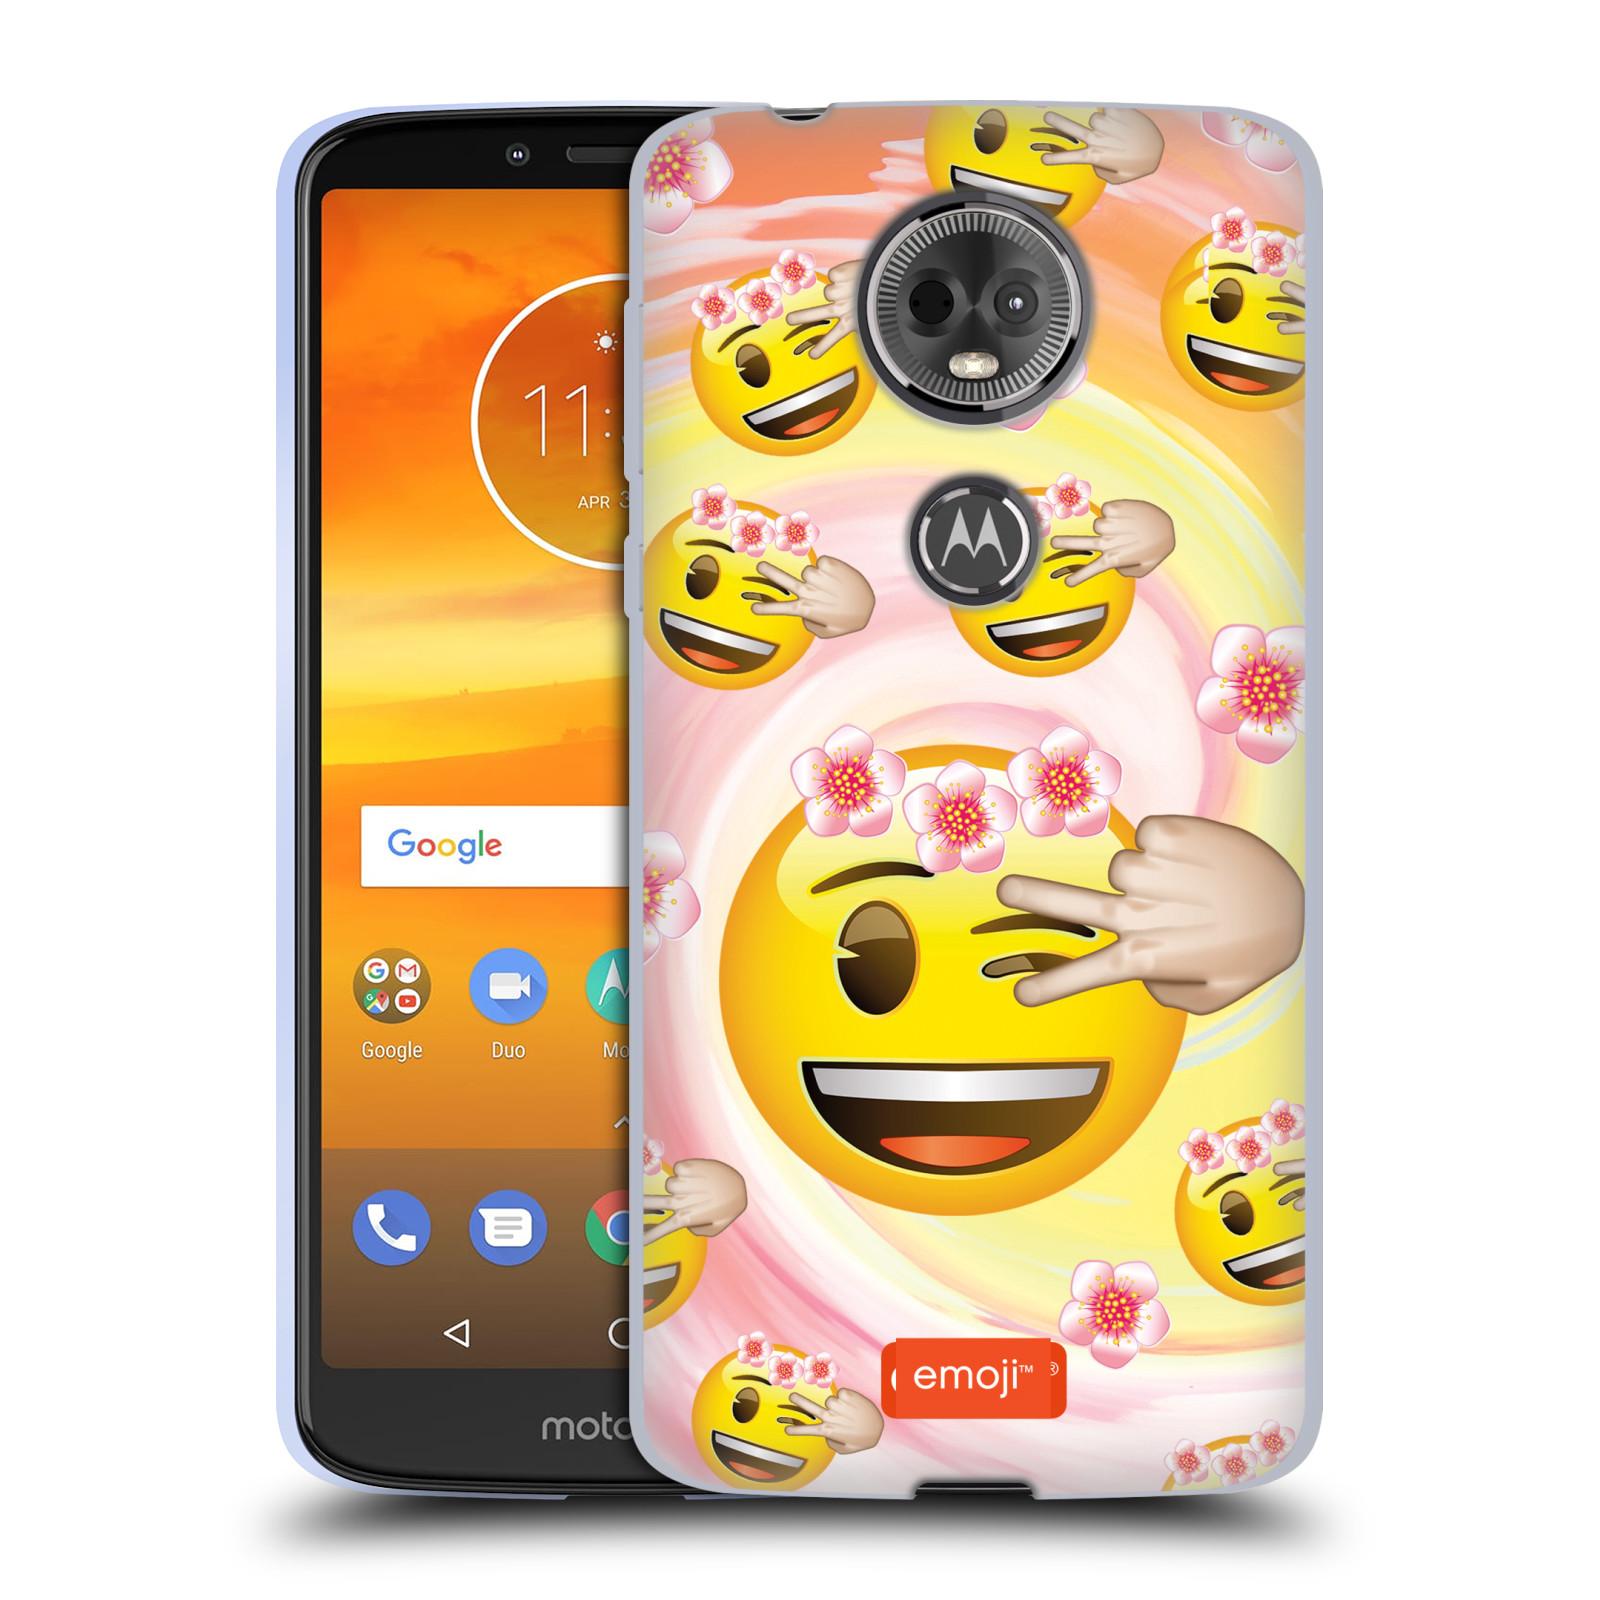 Silikonové pouzdro na mobil Motorola Moto E5 Plus - Head Case - EMOJI - Mrkající smajlíci a kytičky